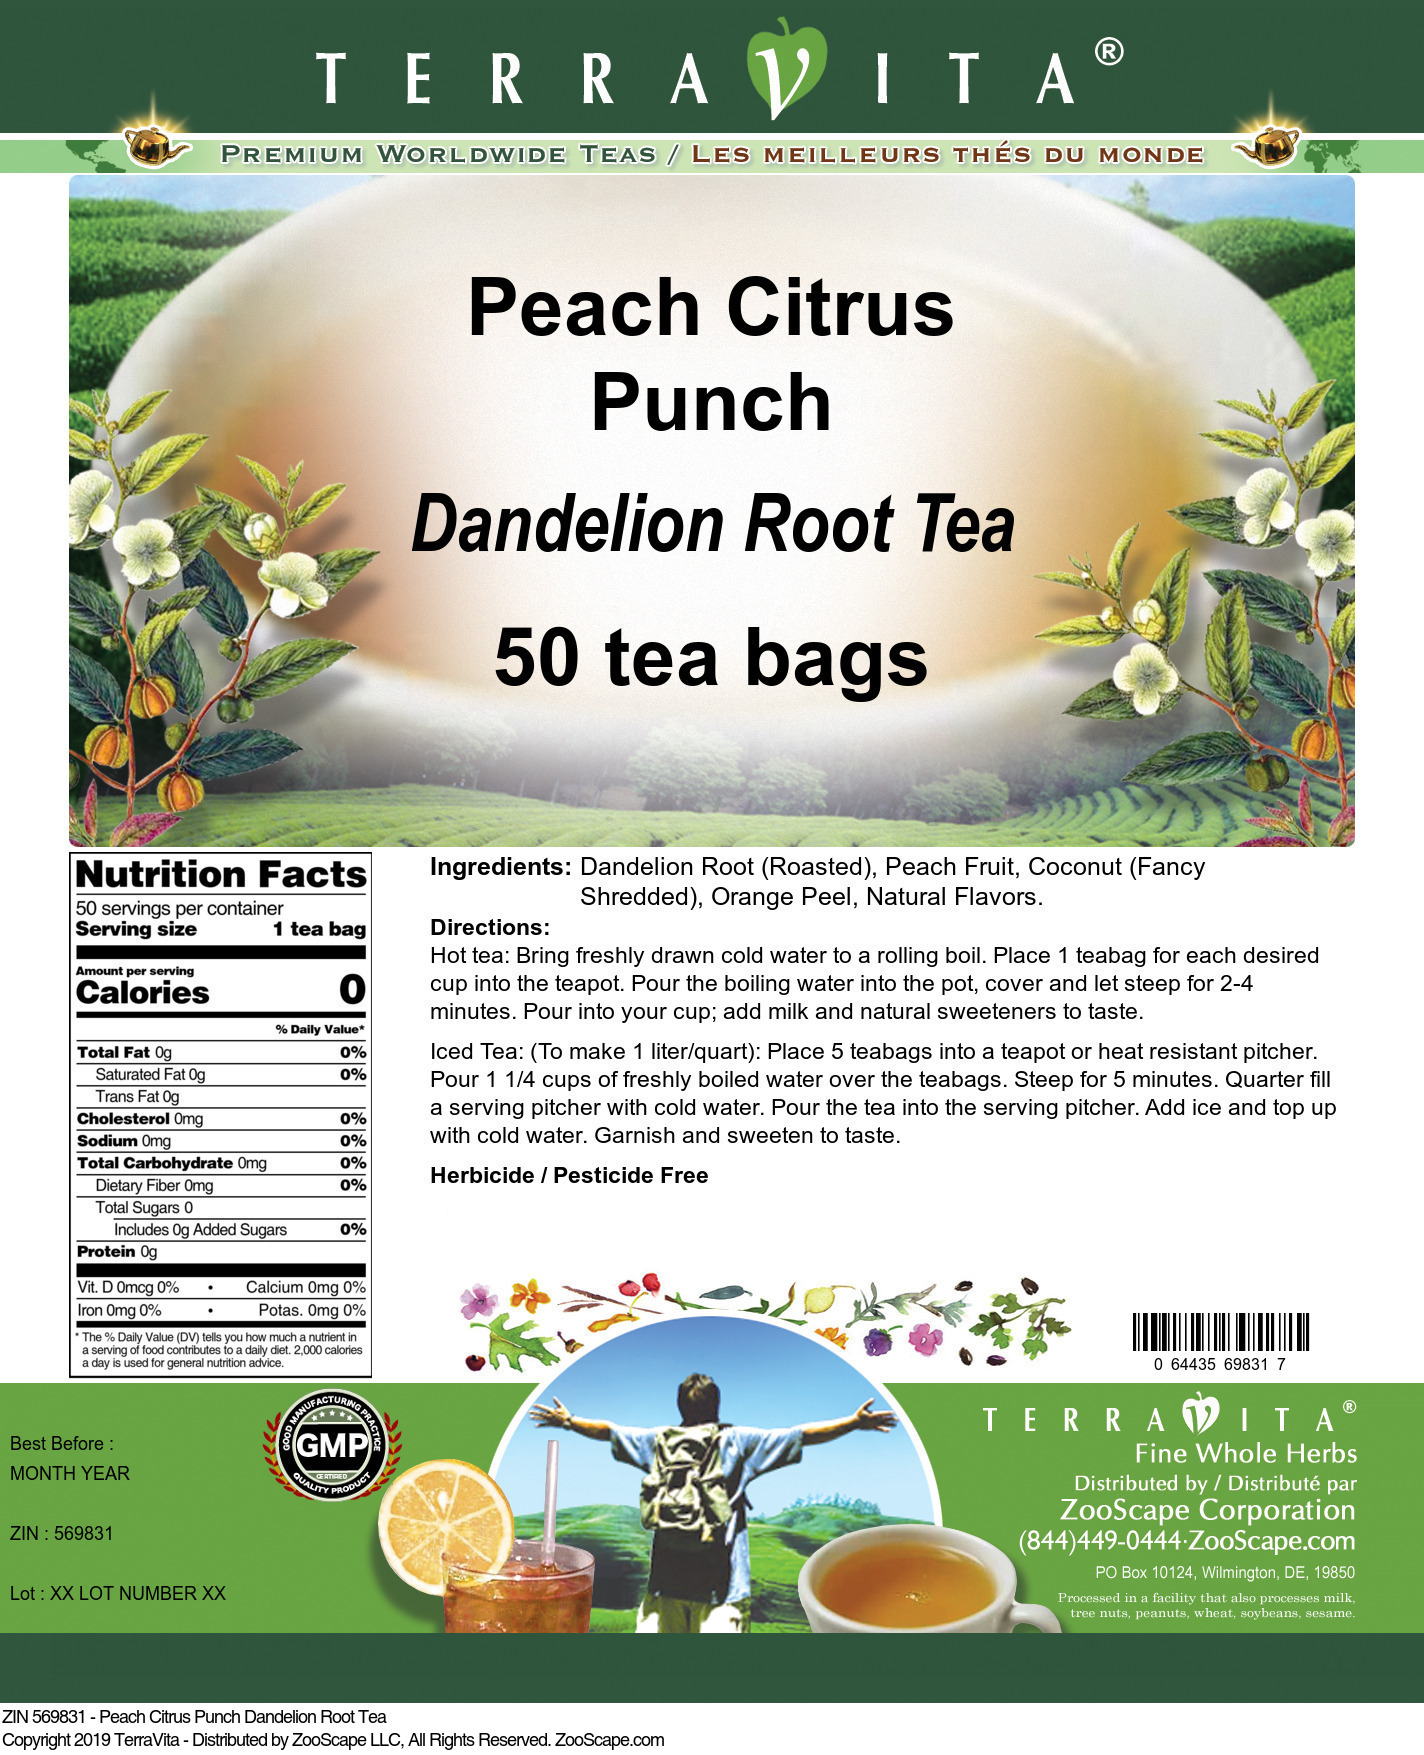 Peach Citrus Punch Dandelion Root Tea